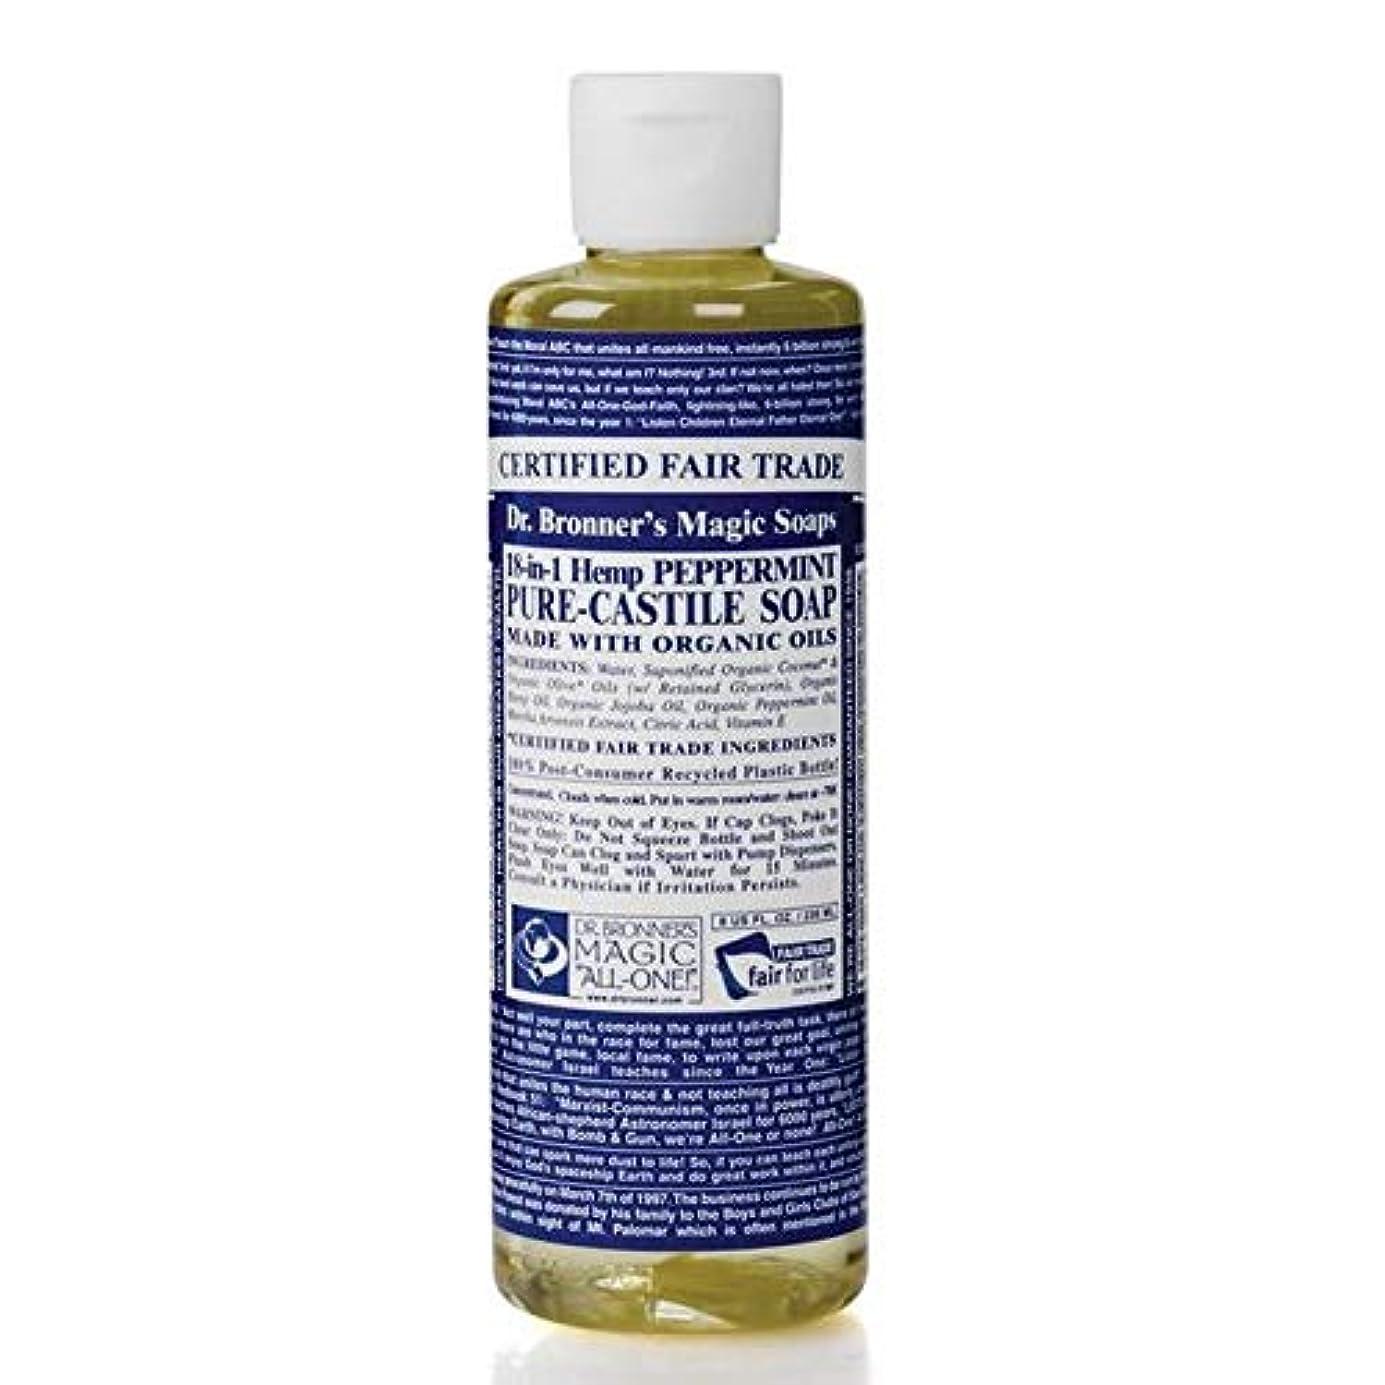 [Dr Bronner] Dr。ブロナーズオーガニックペパーミントカスティーリャ液体石鹸473ミリリットル - Dr. Bronner's Organic Peppermint Castile Liquid Soap 473ml [並行輸入品]